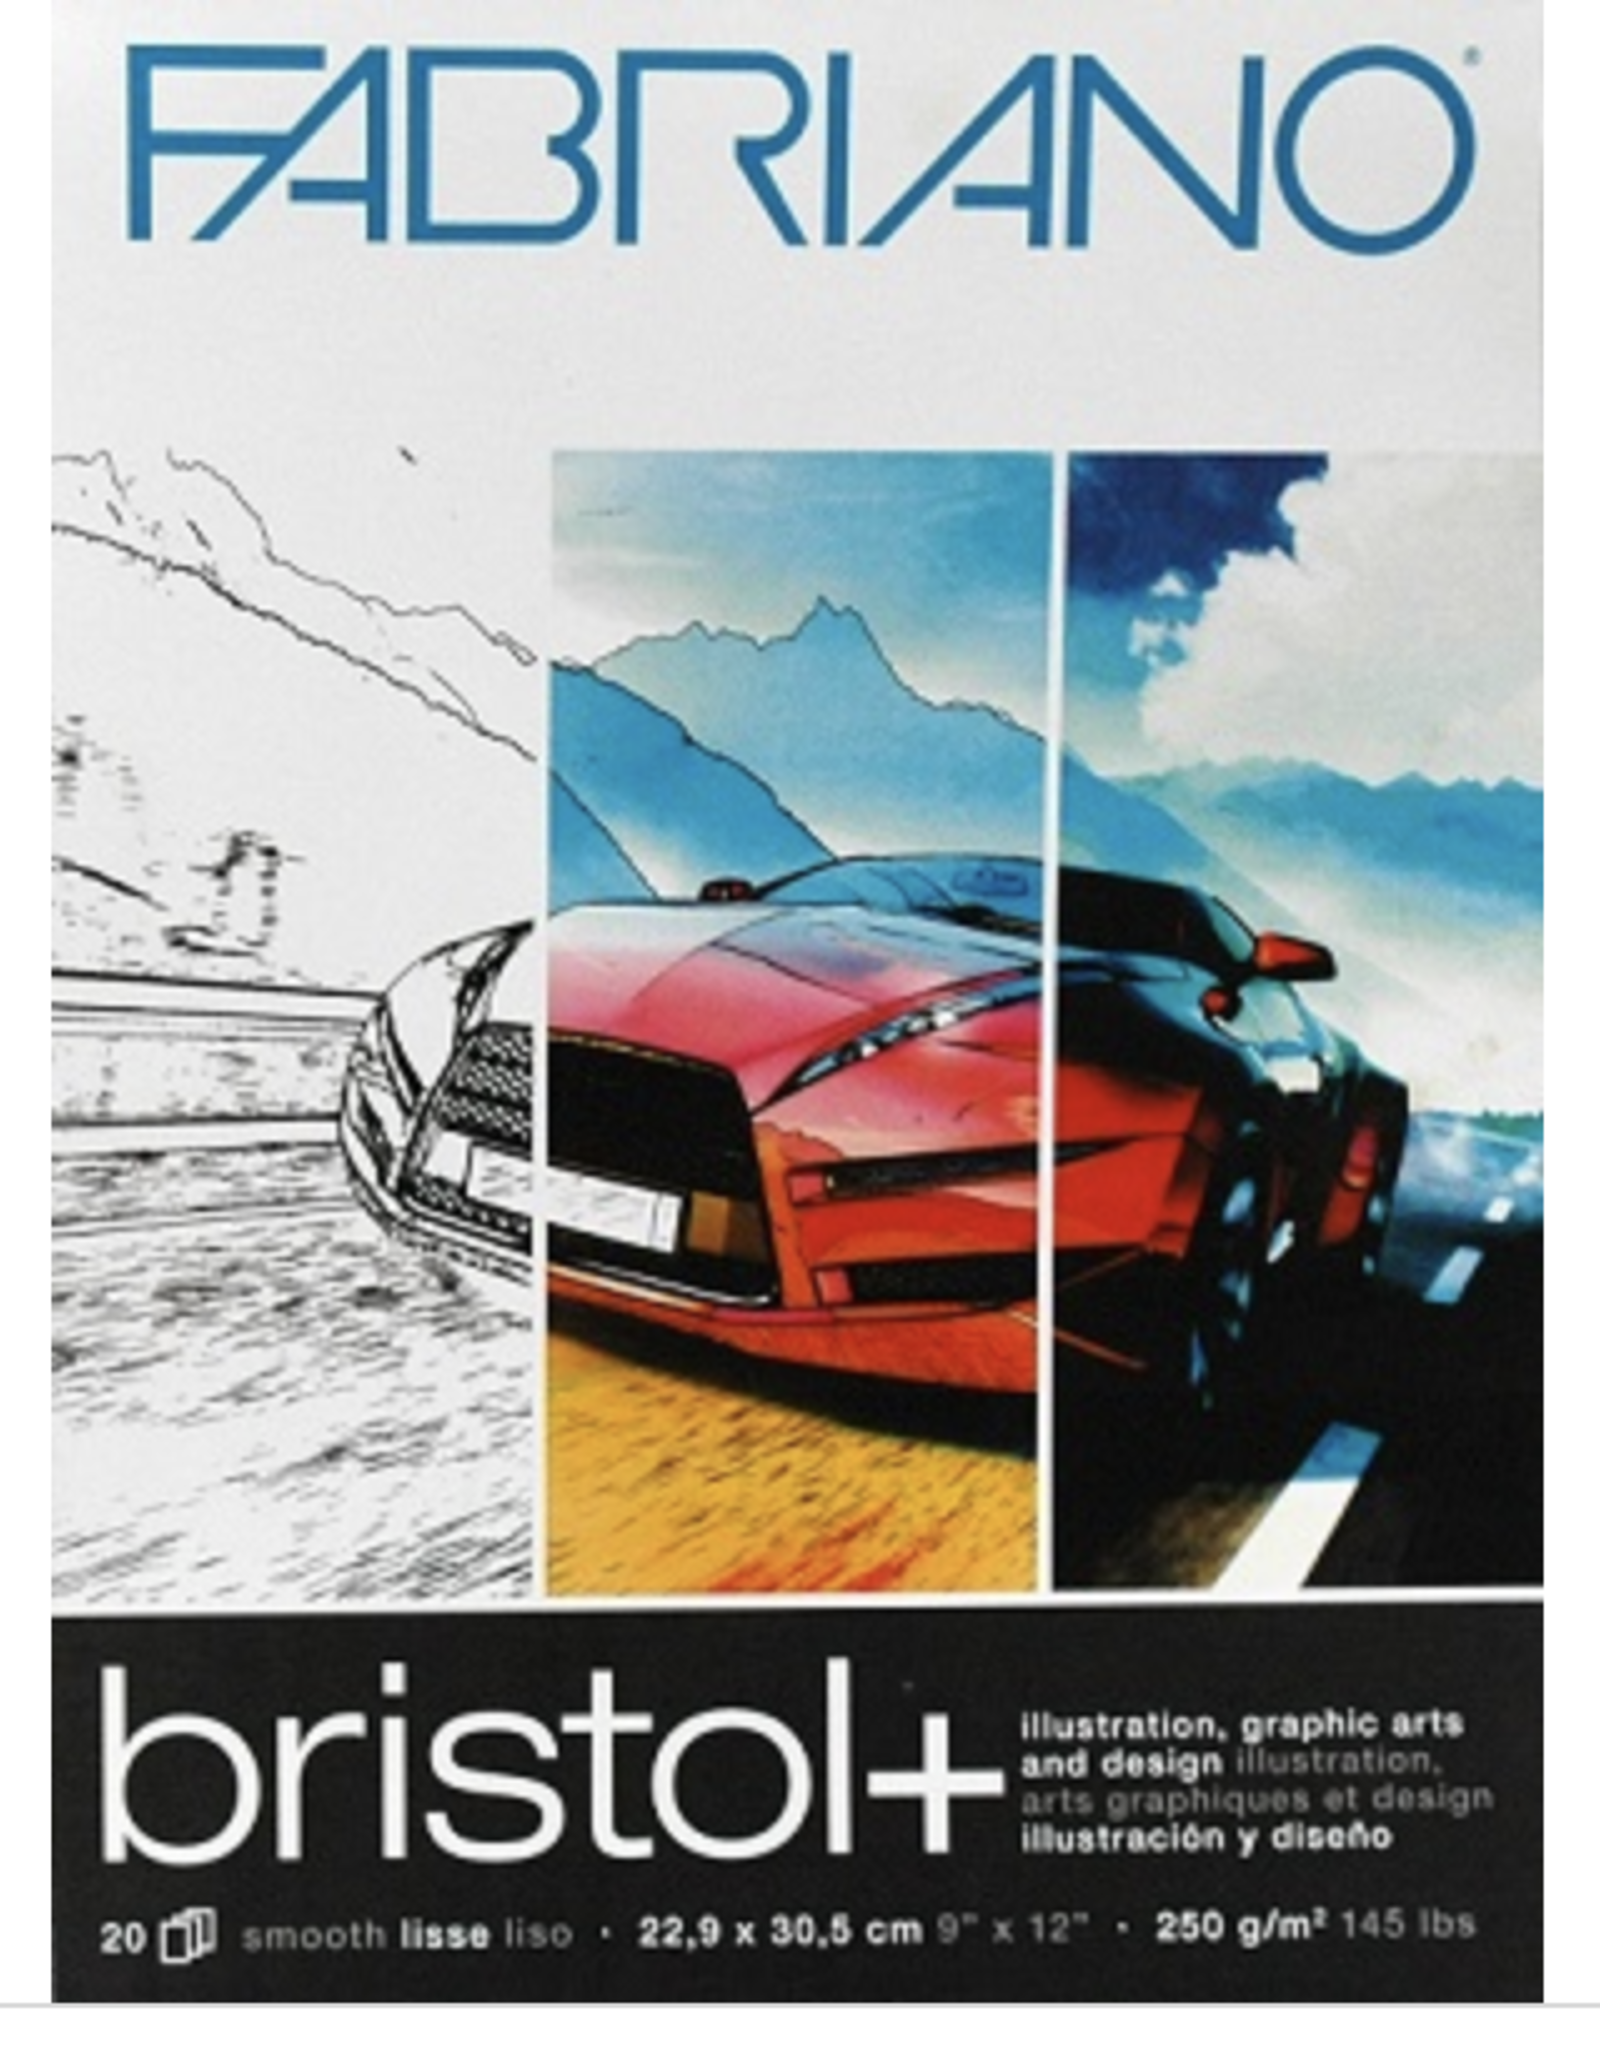 "Bristol + Pad, 11"" x 14"" 20 sheets, 250gsm"